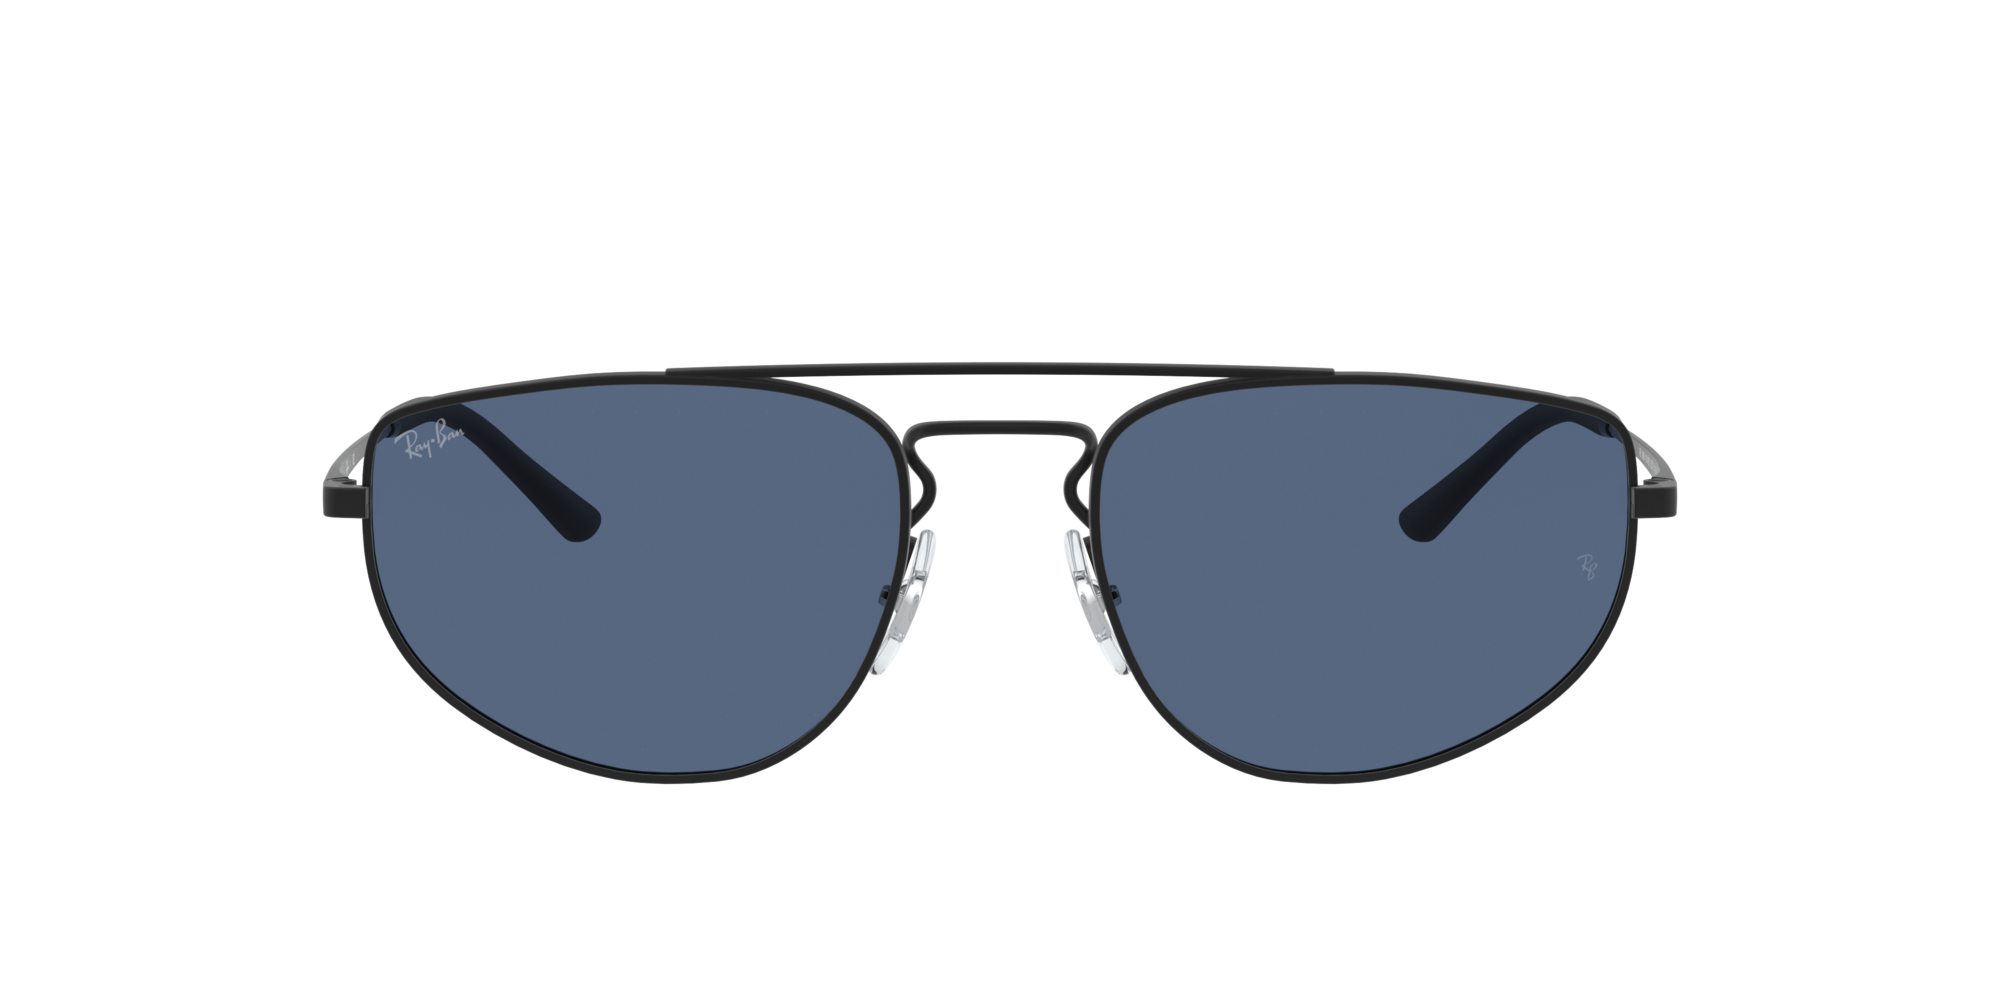 Image for RB3668 55 from LensCrafters | Glasses, Prescription Glasses Online, Eyewear